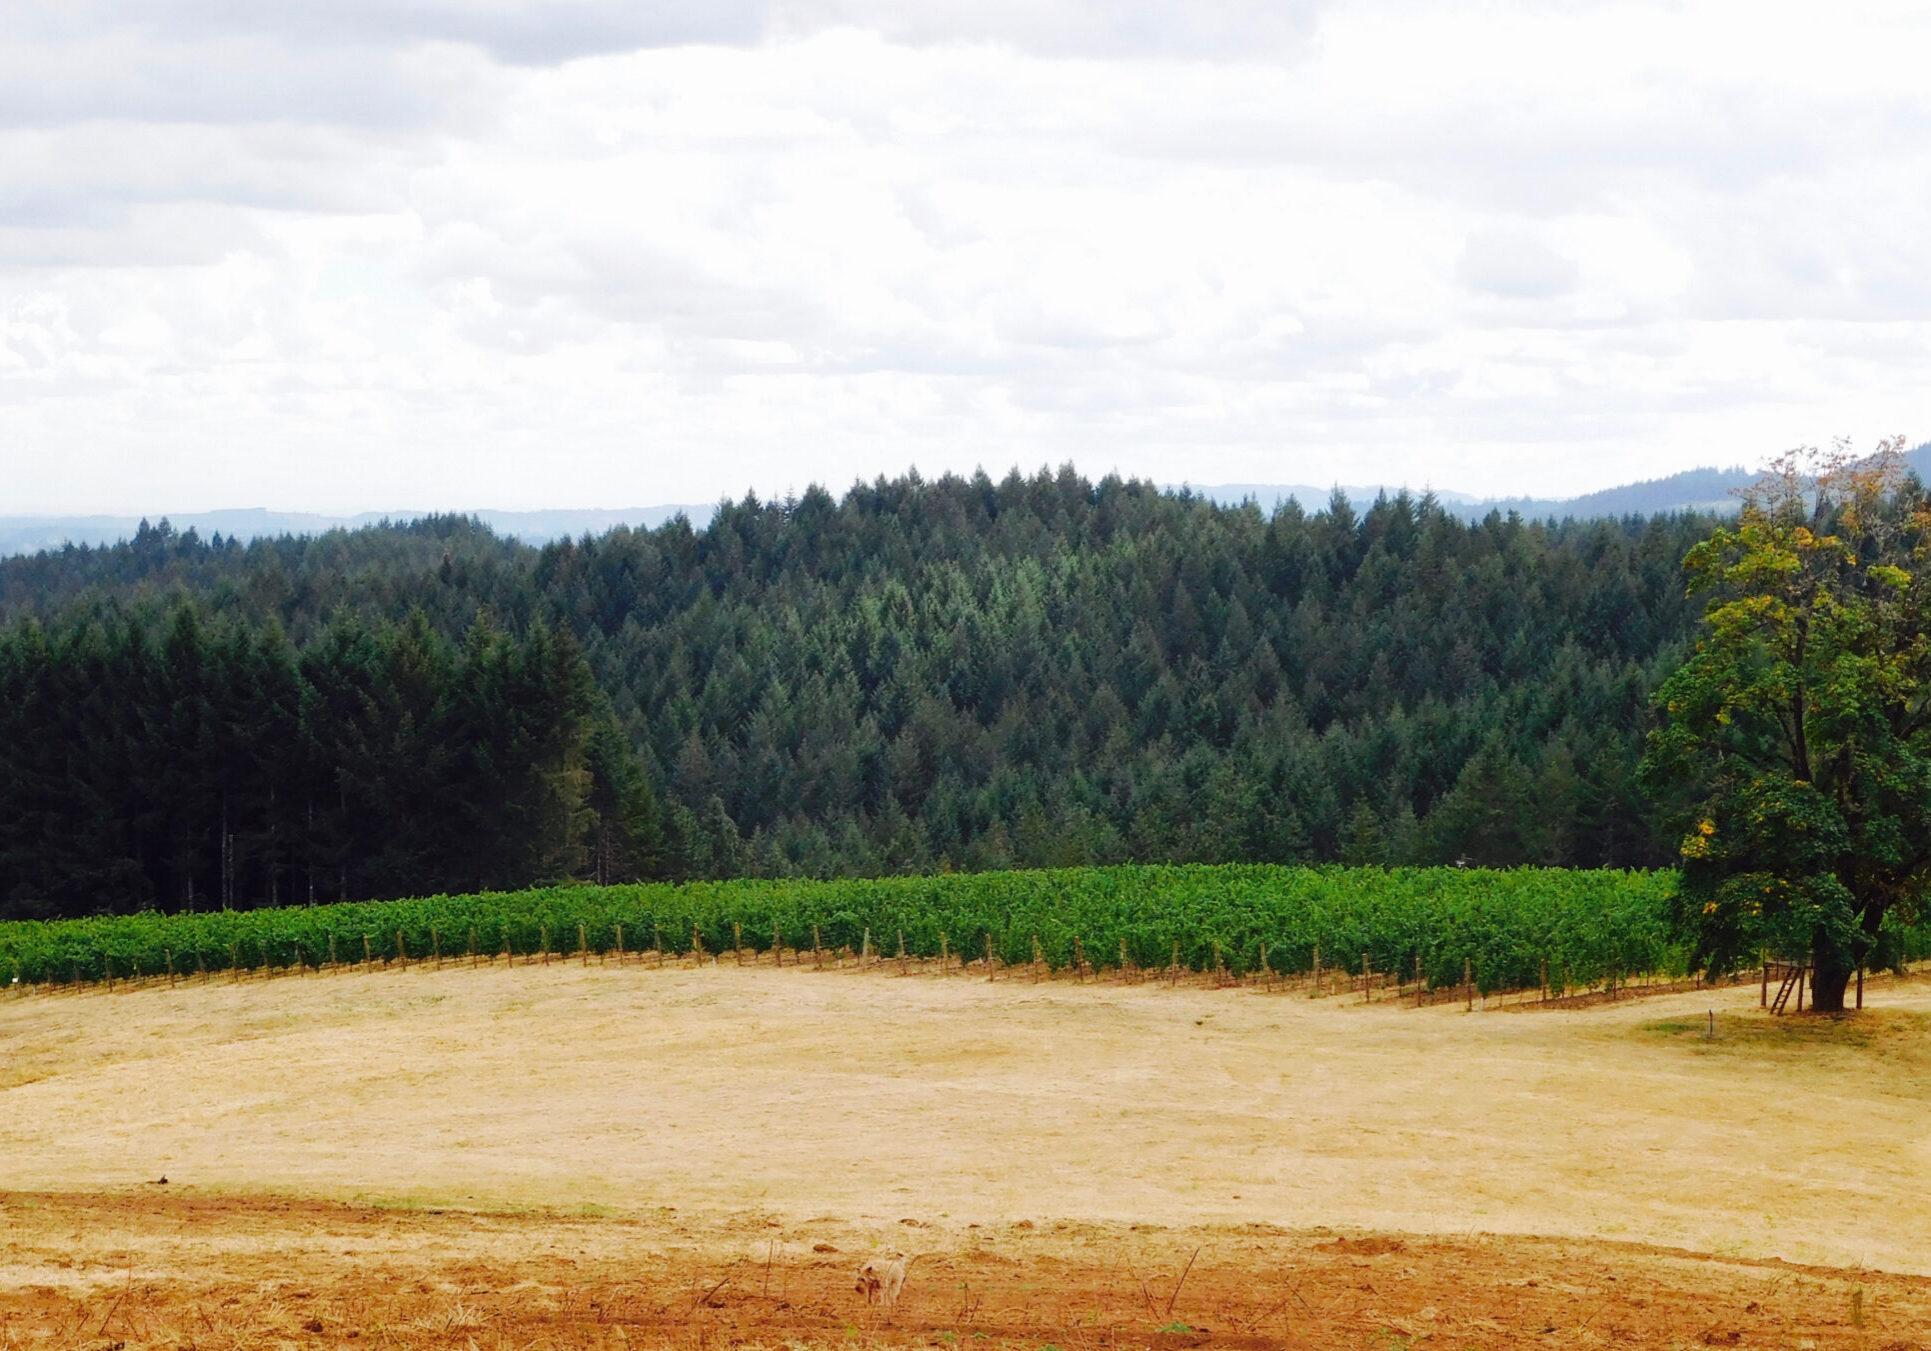 vineyard horizontal